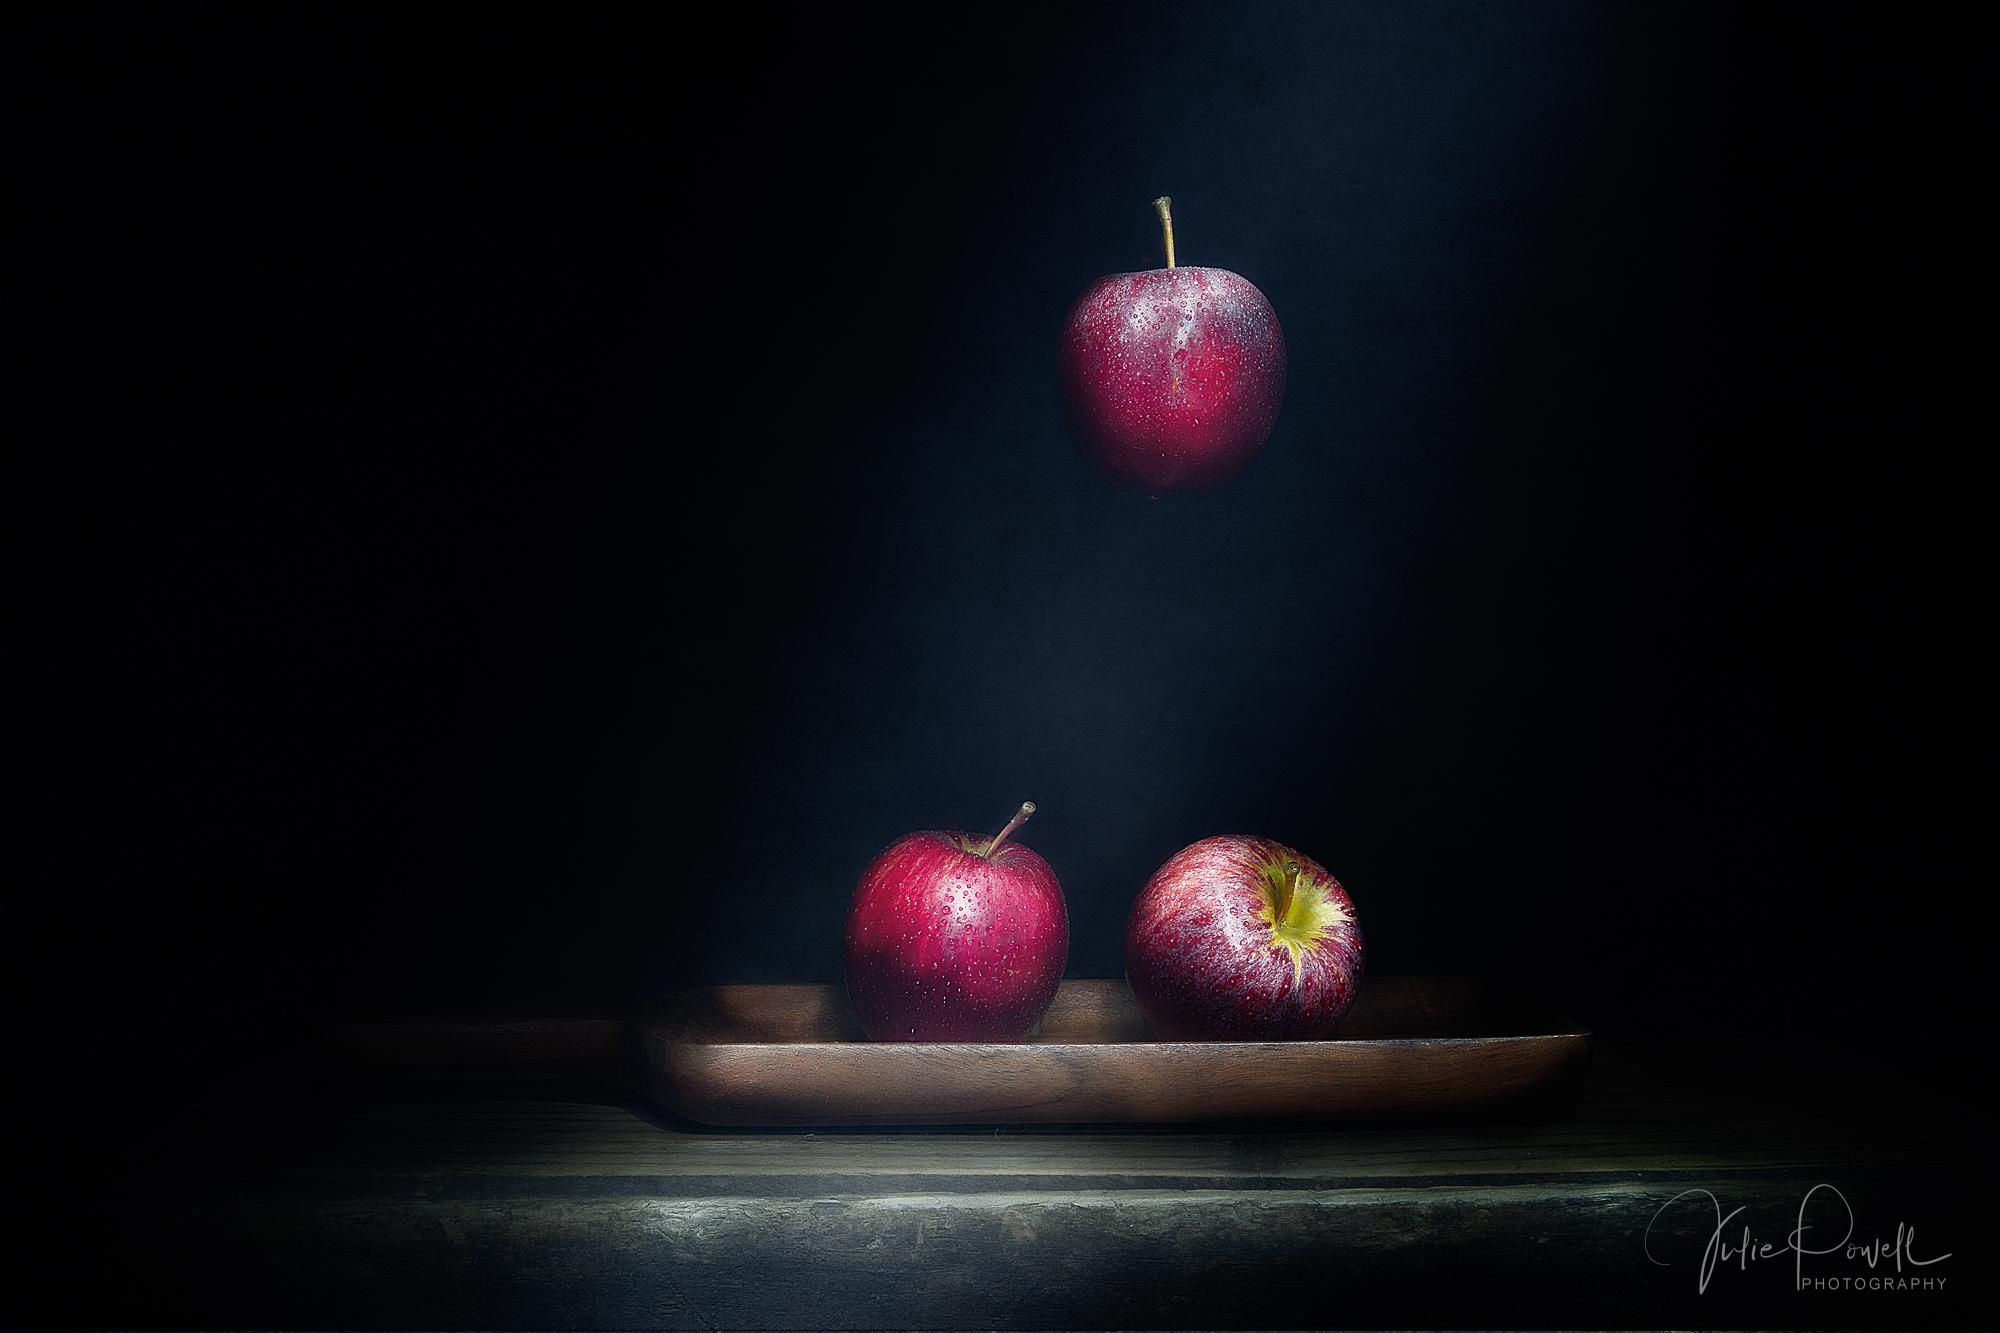 Julie Powell_Newtons Apple.jpg